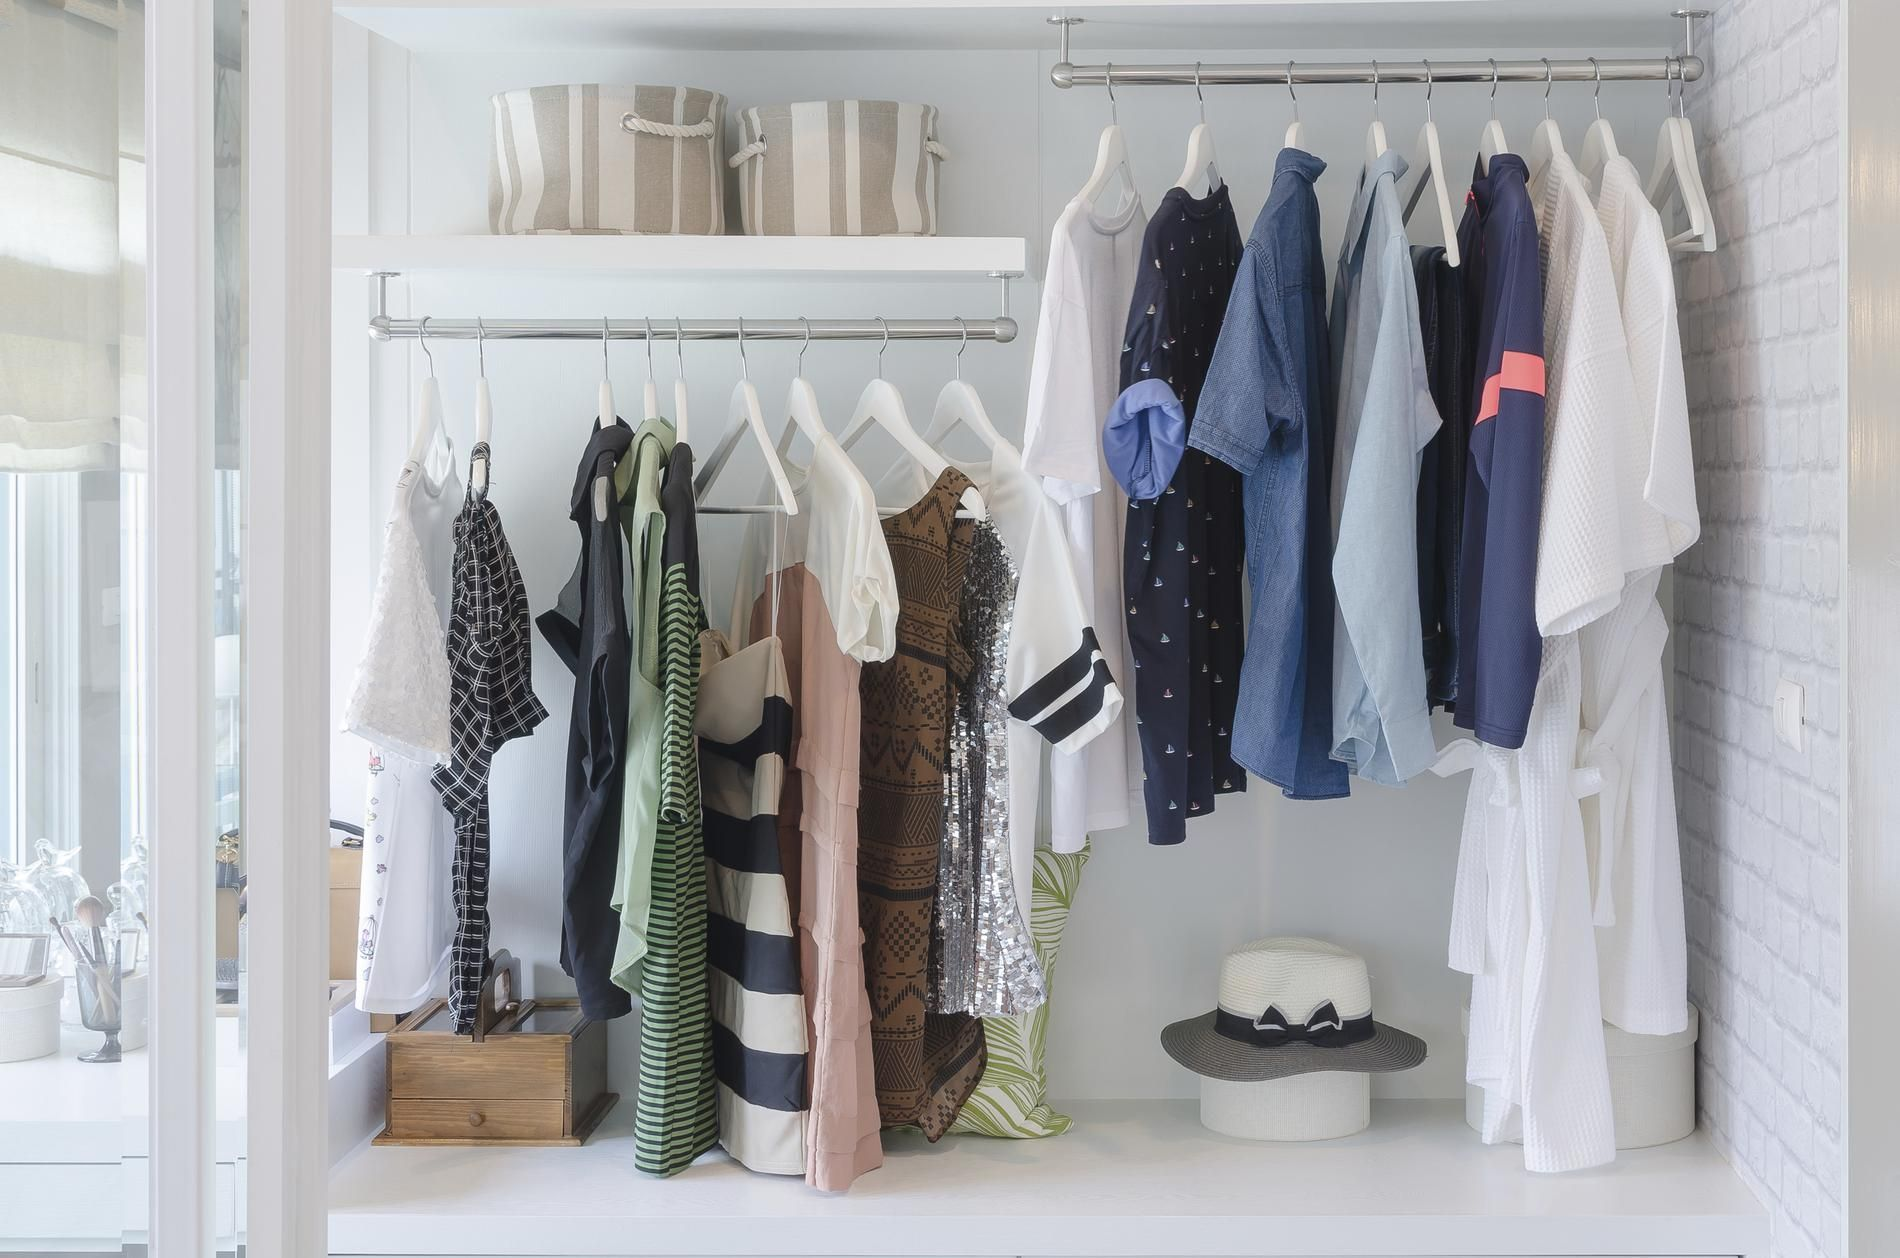 Le dressing 333 la garde robe minimaliste adapt e la for Rangement minimaliste